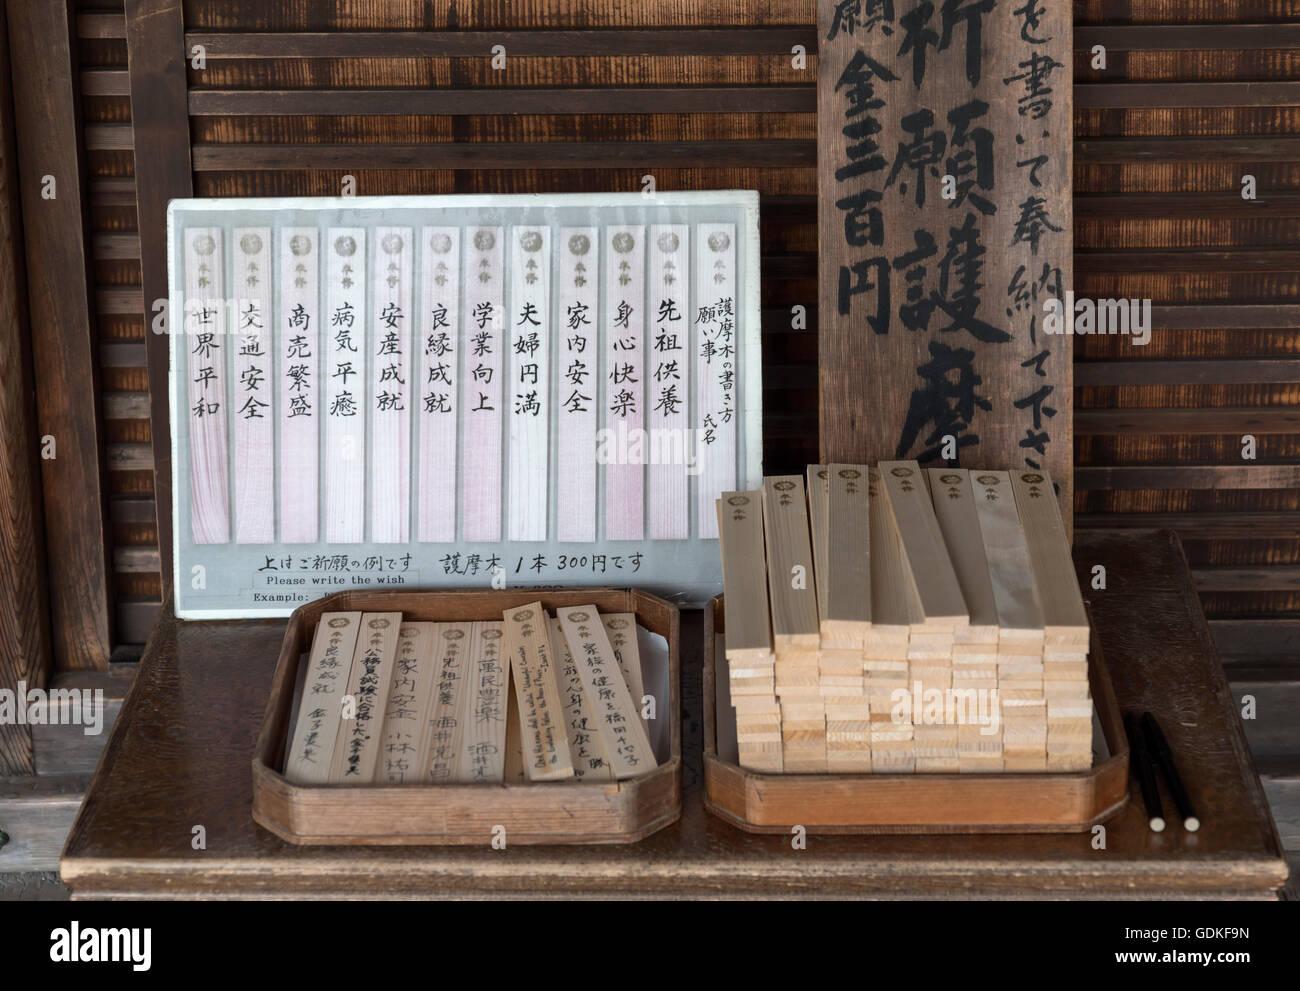 Placas al deseo de madera Nanzen-ji templo Budista Zen en Kioto, Japón Imagen De Stock